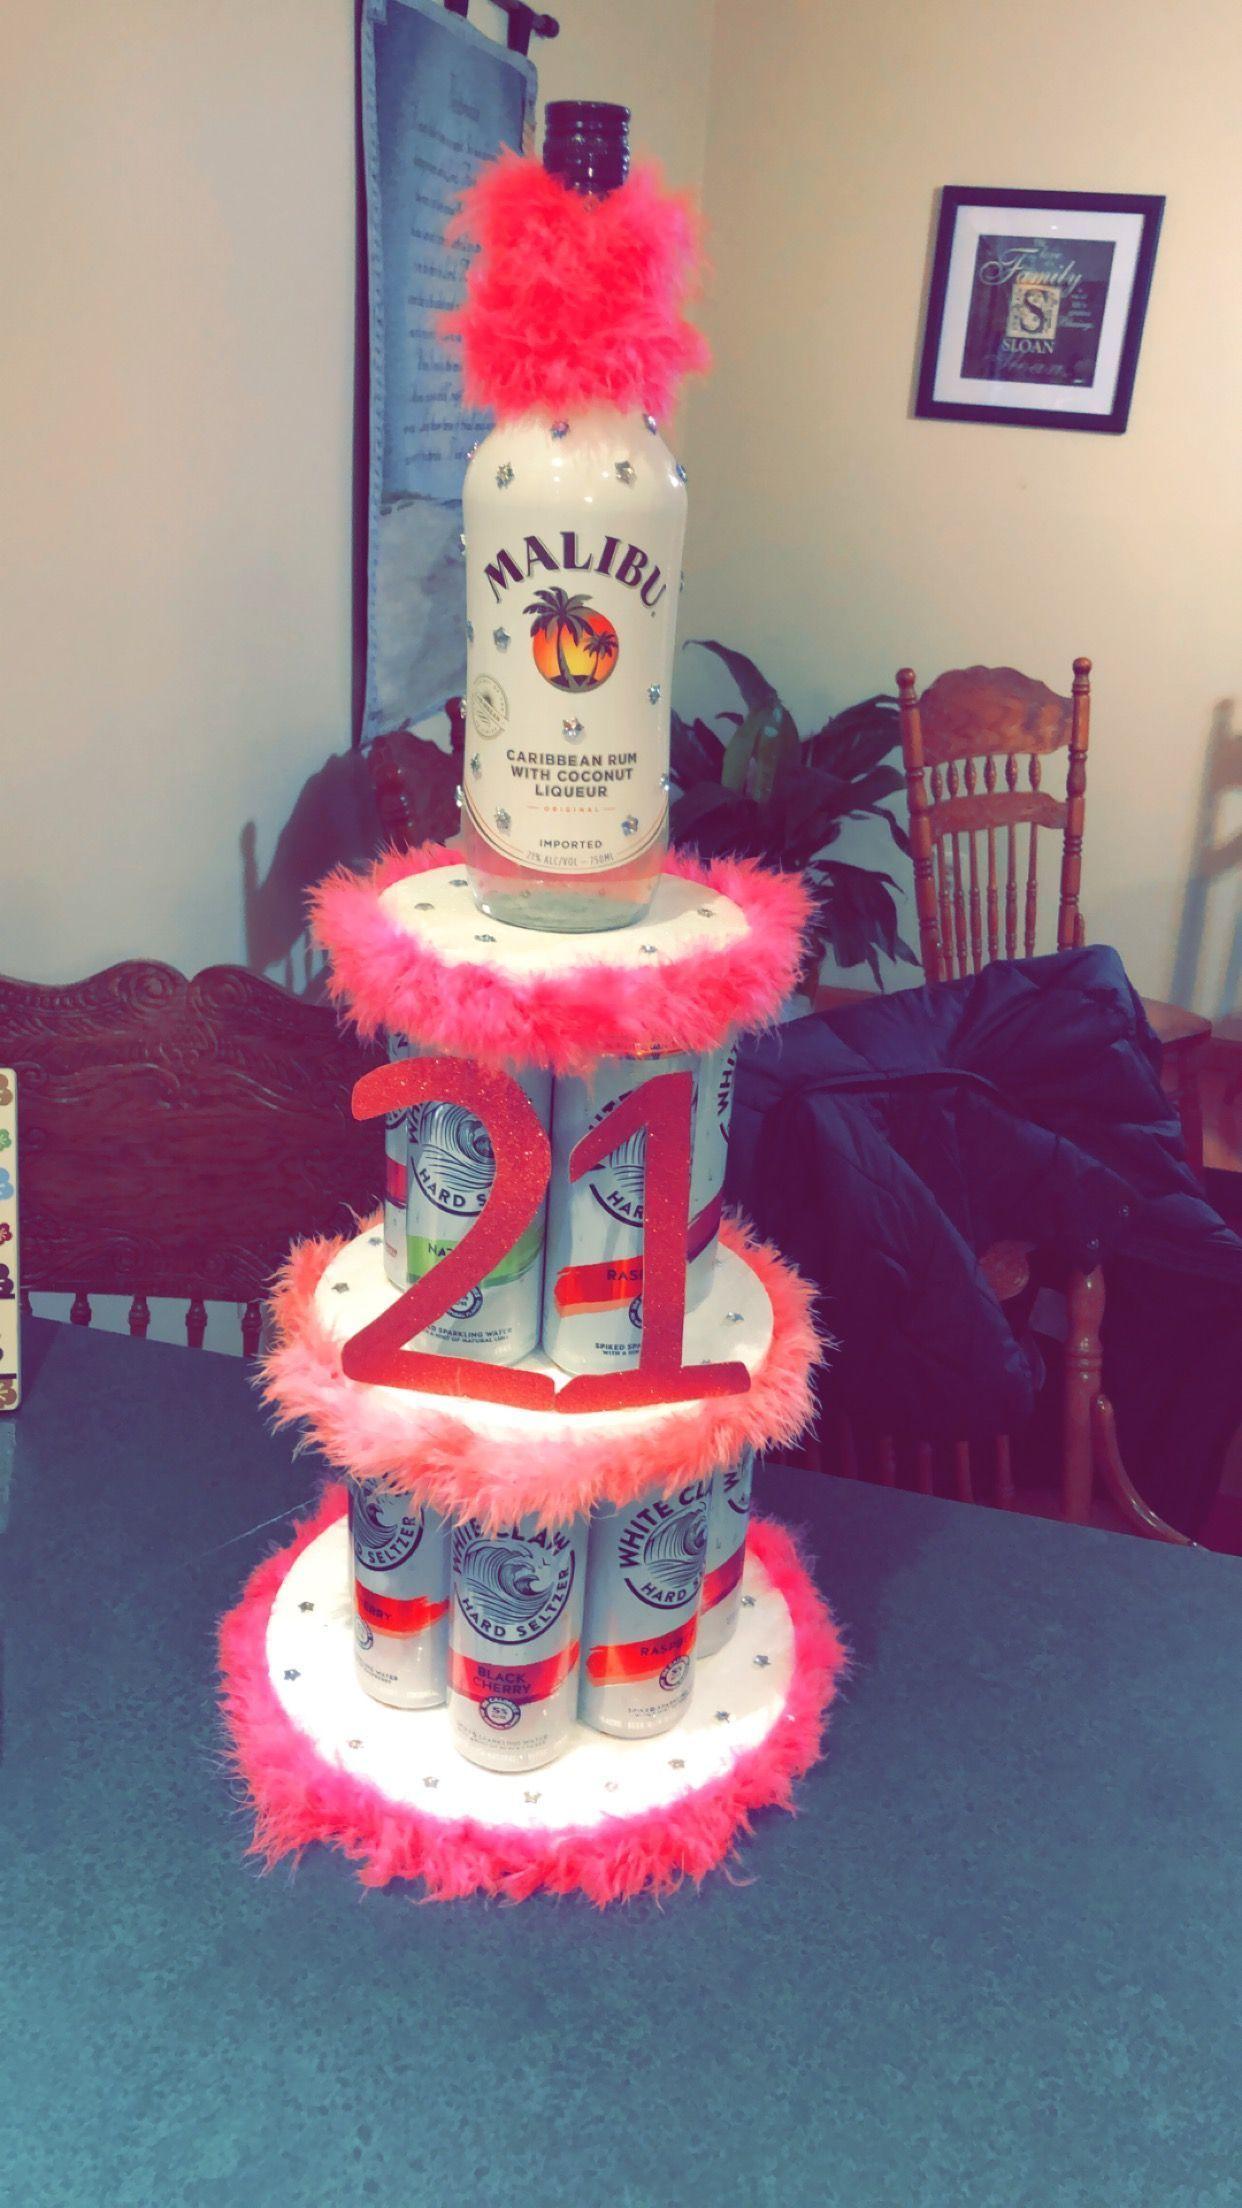 DIY 21st Birthday Alcohol cake - #21st #alcohol #birthday #Cake #DIY